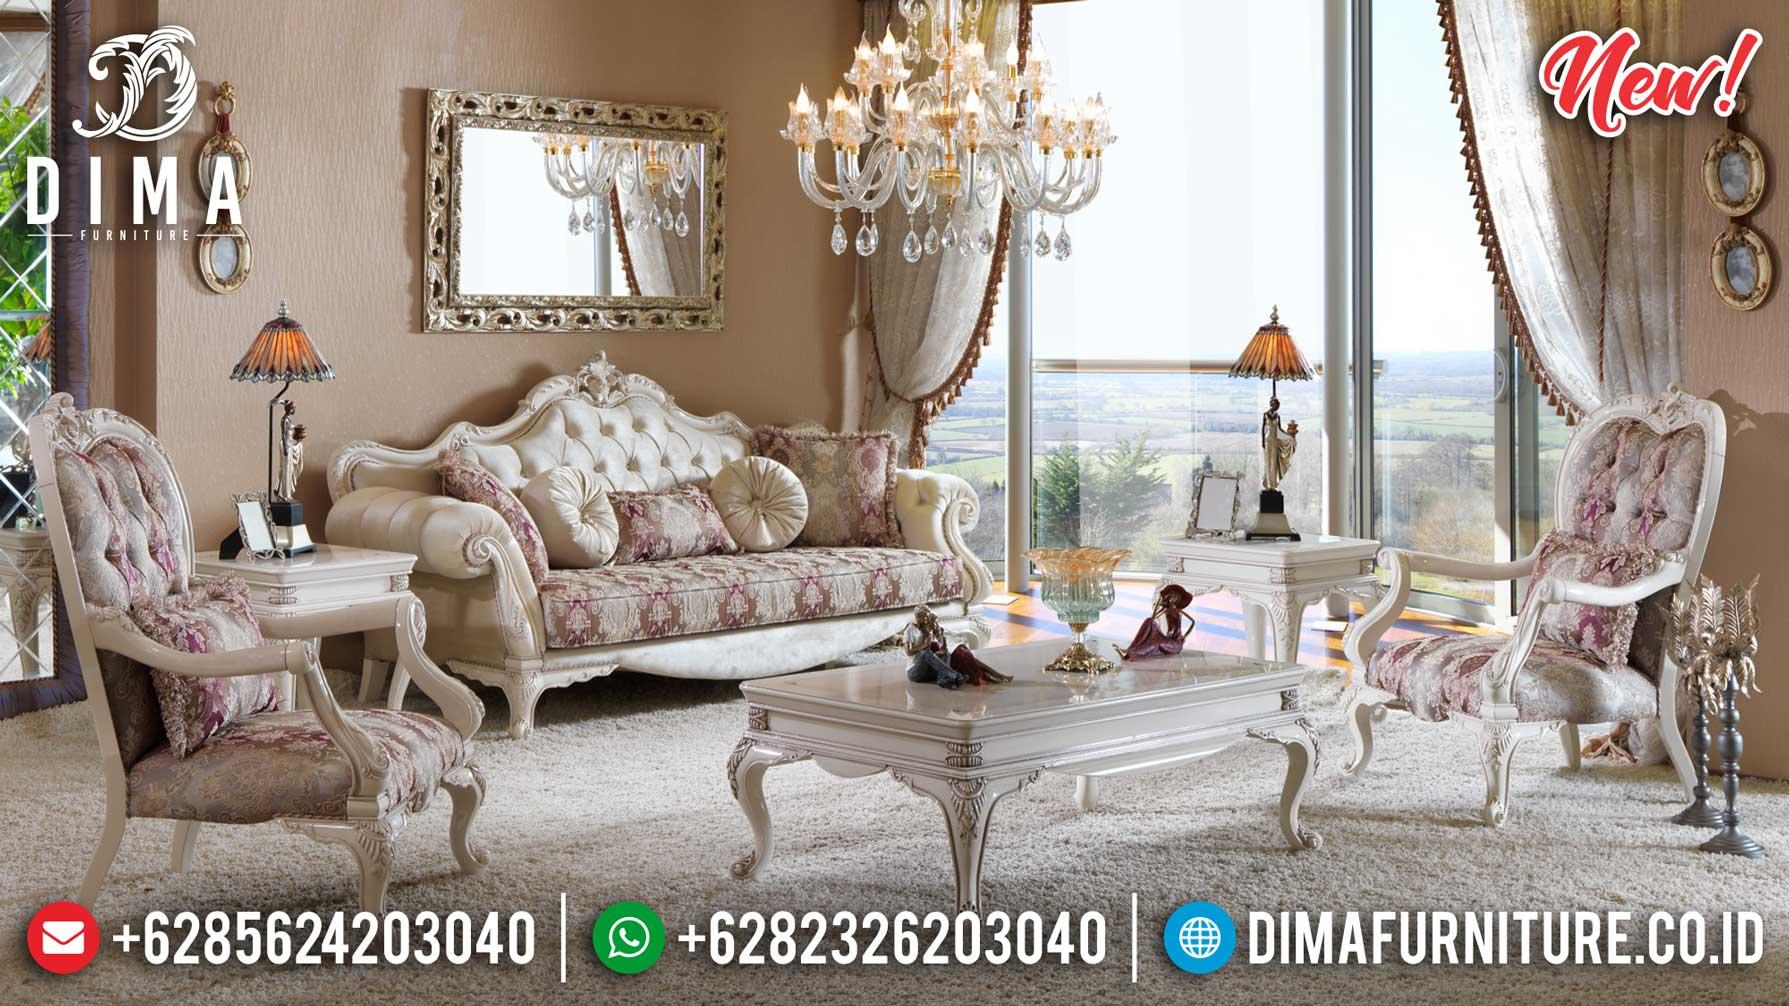 Desain Sofa Tamu Mewah Jepara Luxury Carving High Quality Solid Wood Grade A TTJ-1261